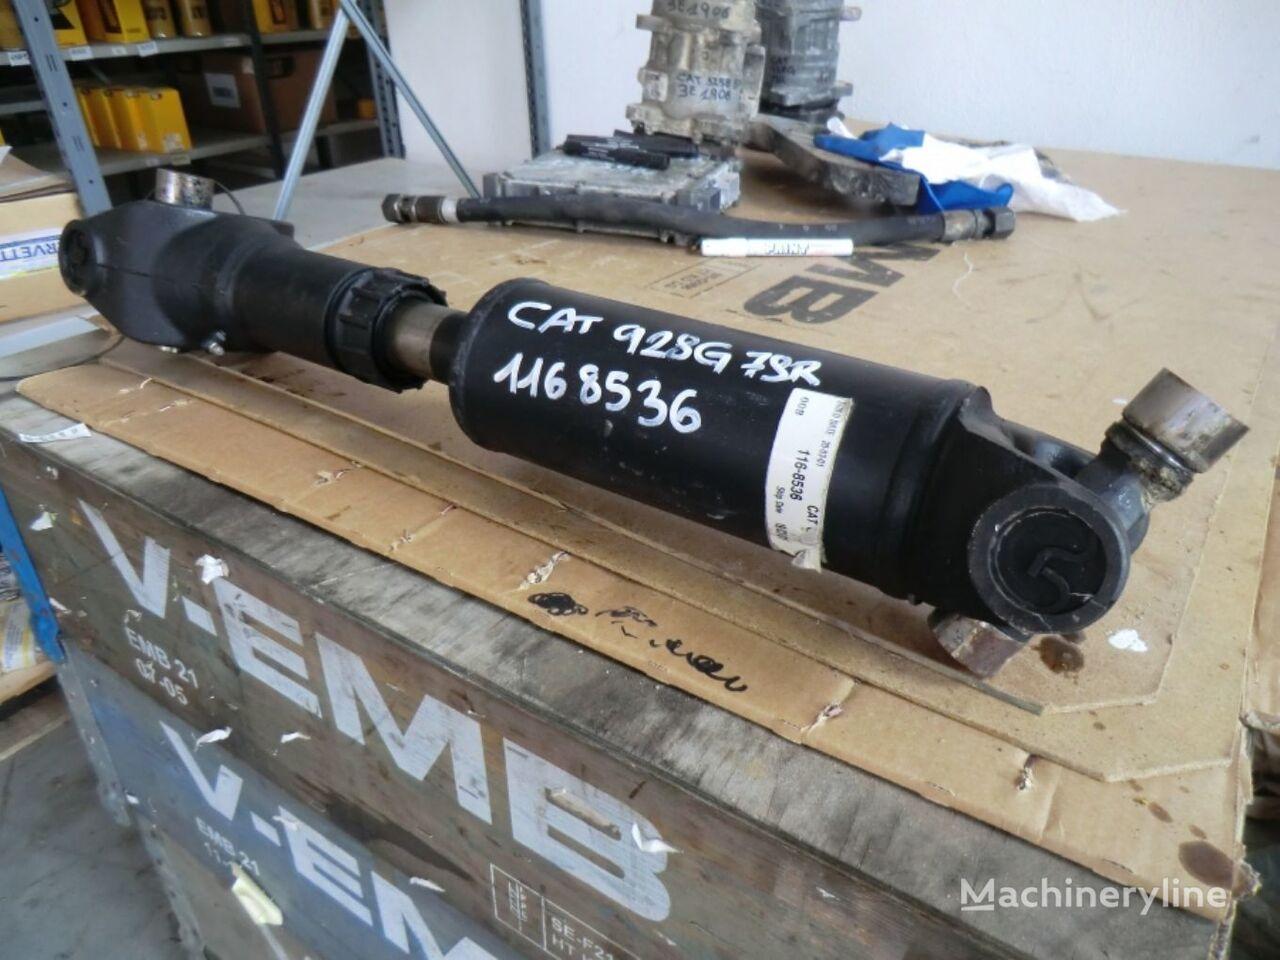 DRIVE SHAFT GP half-axle for CATERPILLAR 928G 7SR01935 wheel loader